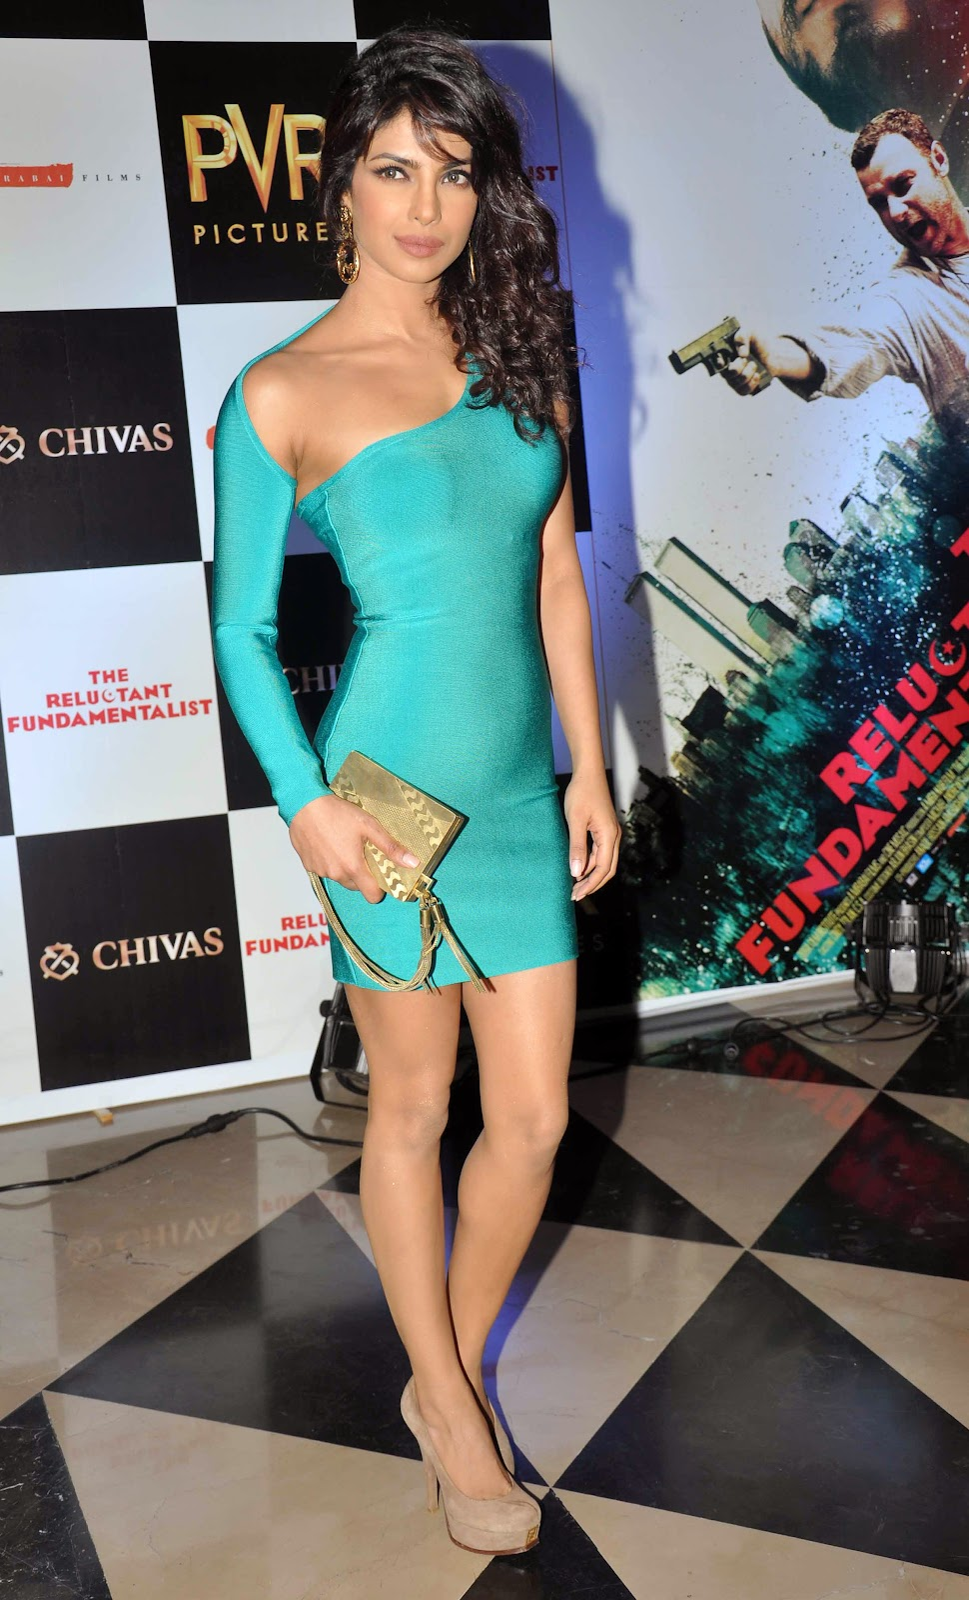 priyanka-chopra-in-tight-sky-blue-mini-dress-flaunting-her-curves